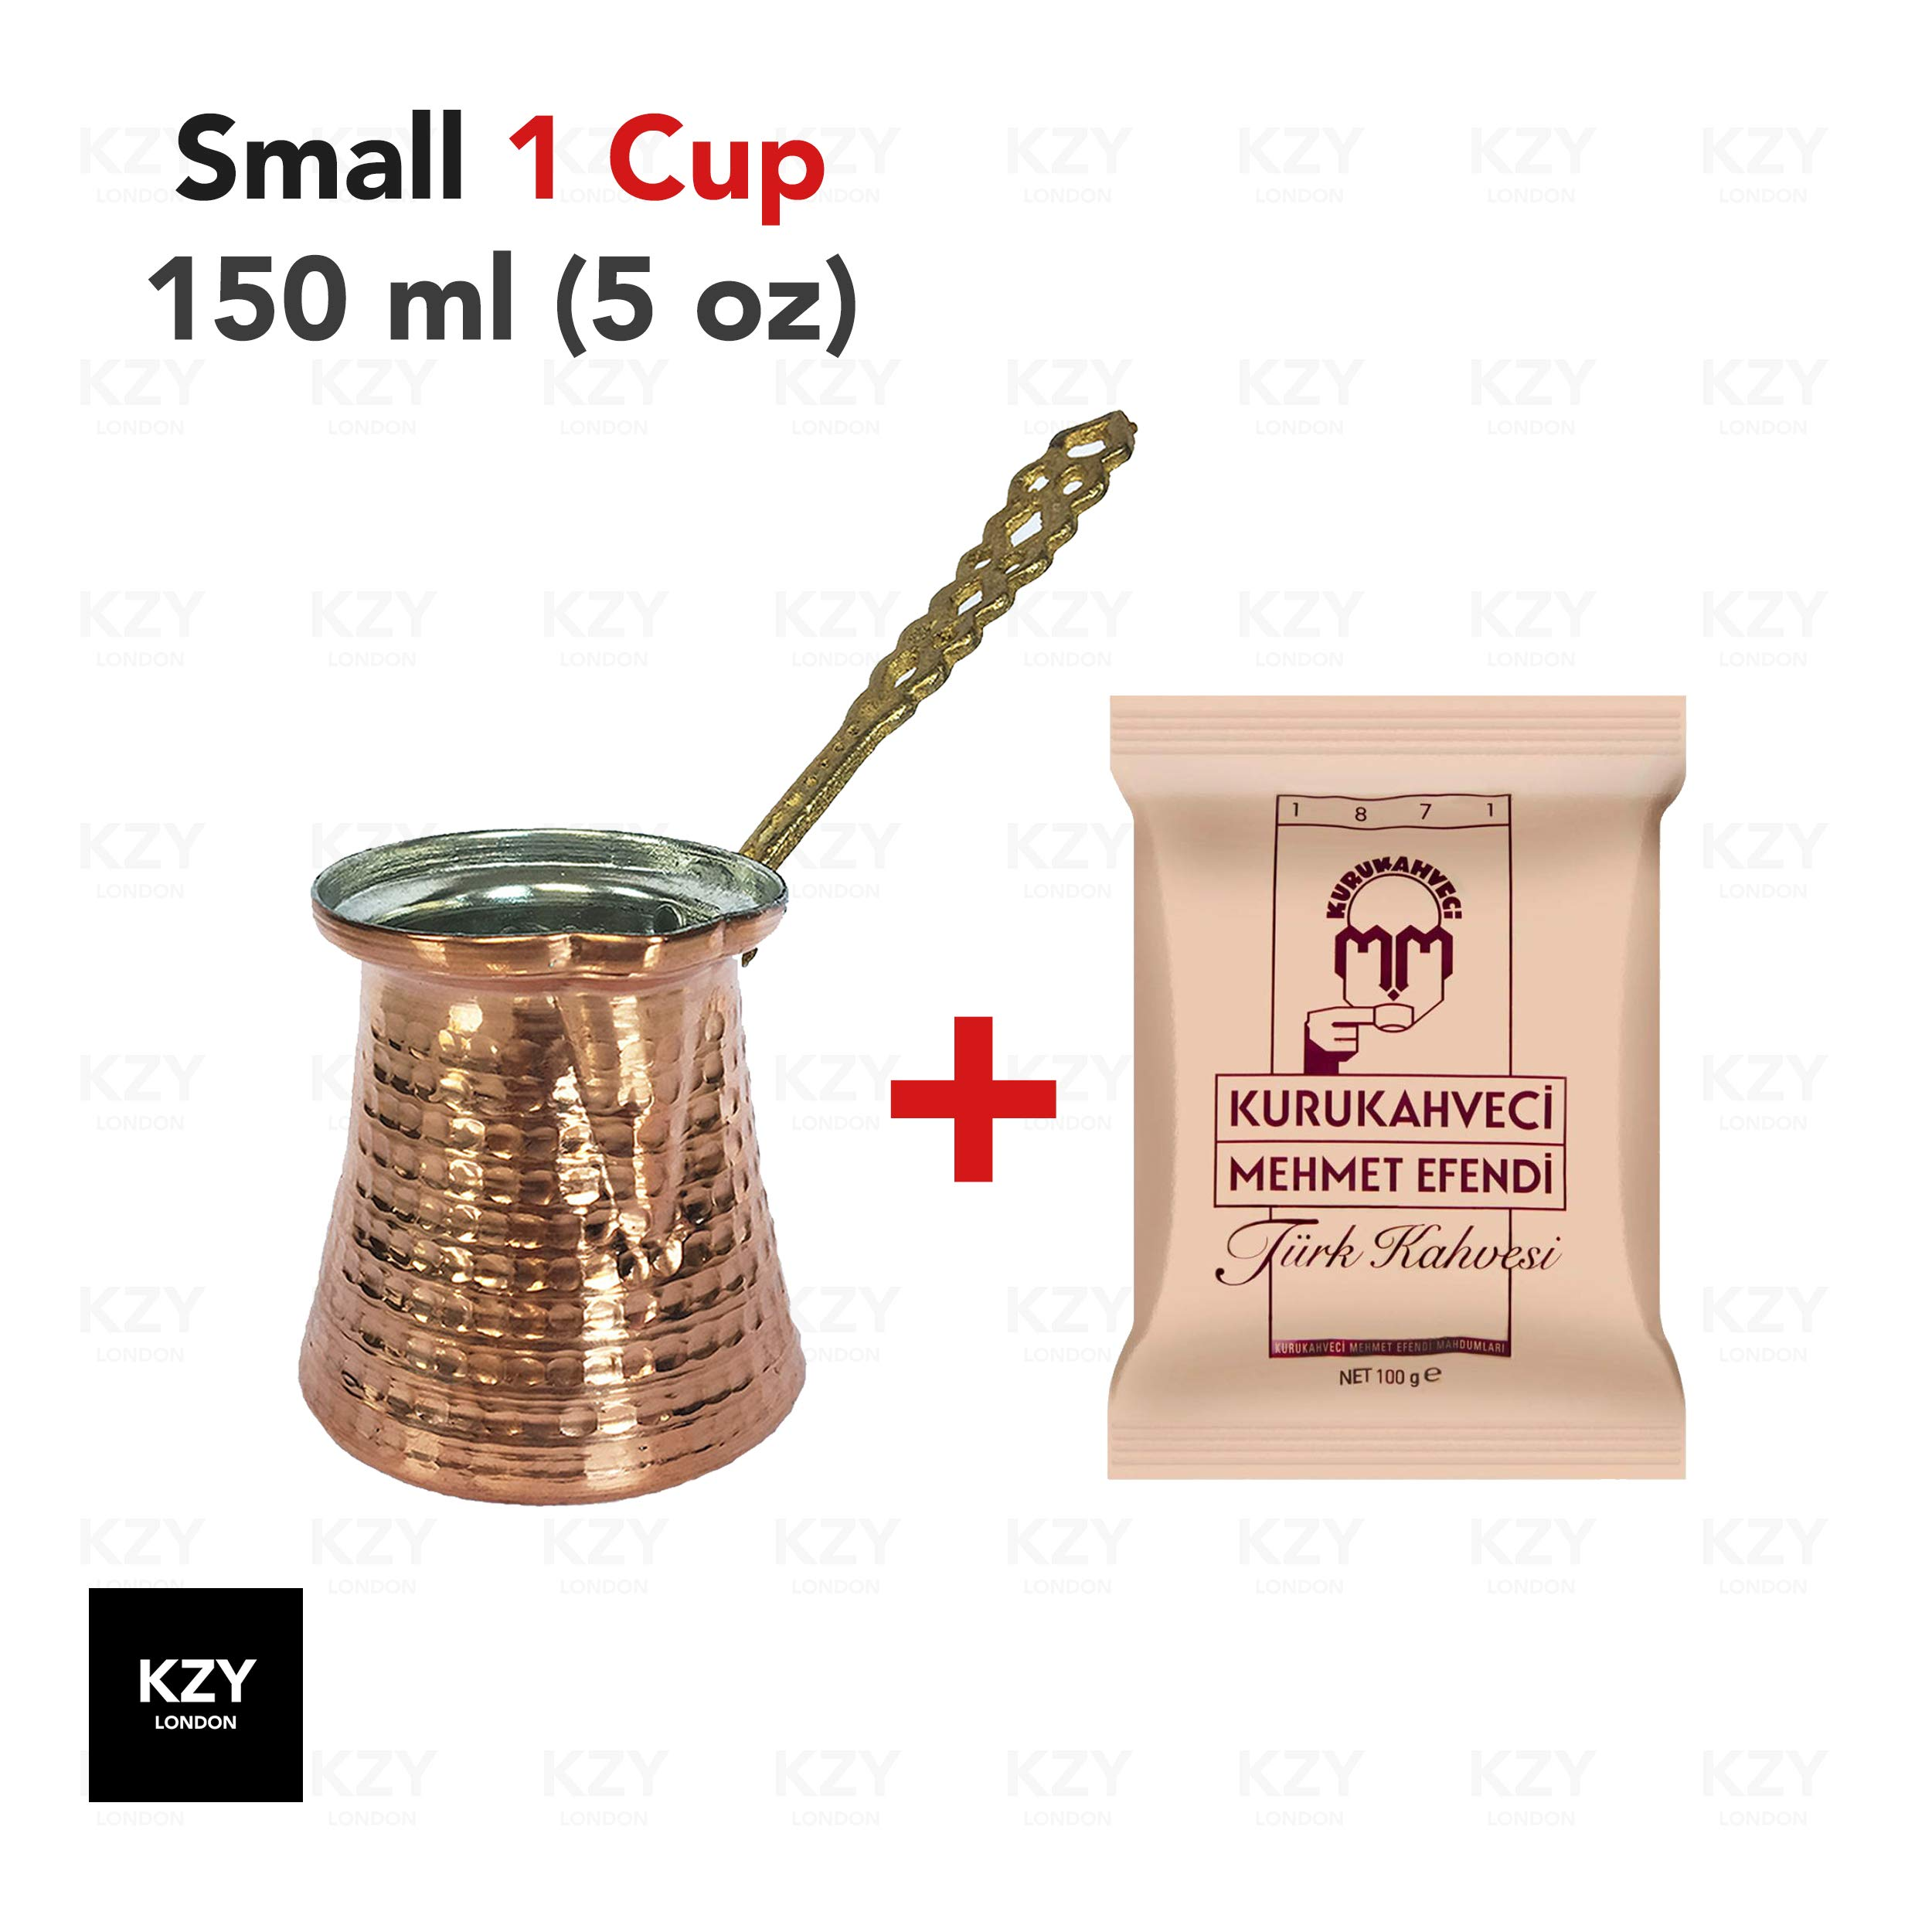 Cafetera turca de cobre 150 ml + 100 gr coffee cobre: Amazon.es: Hogar